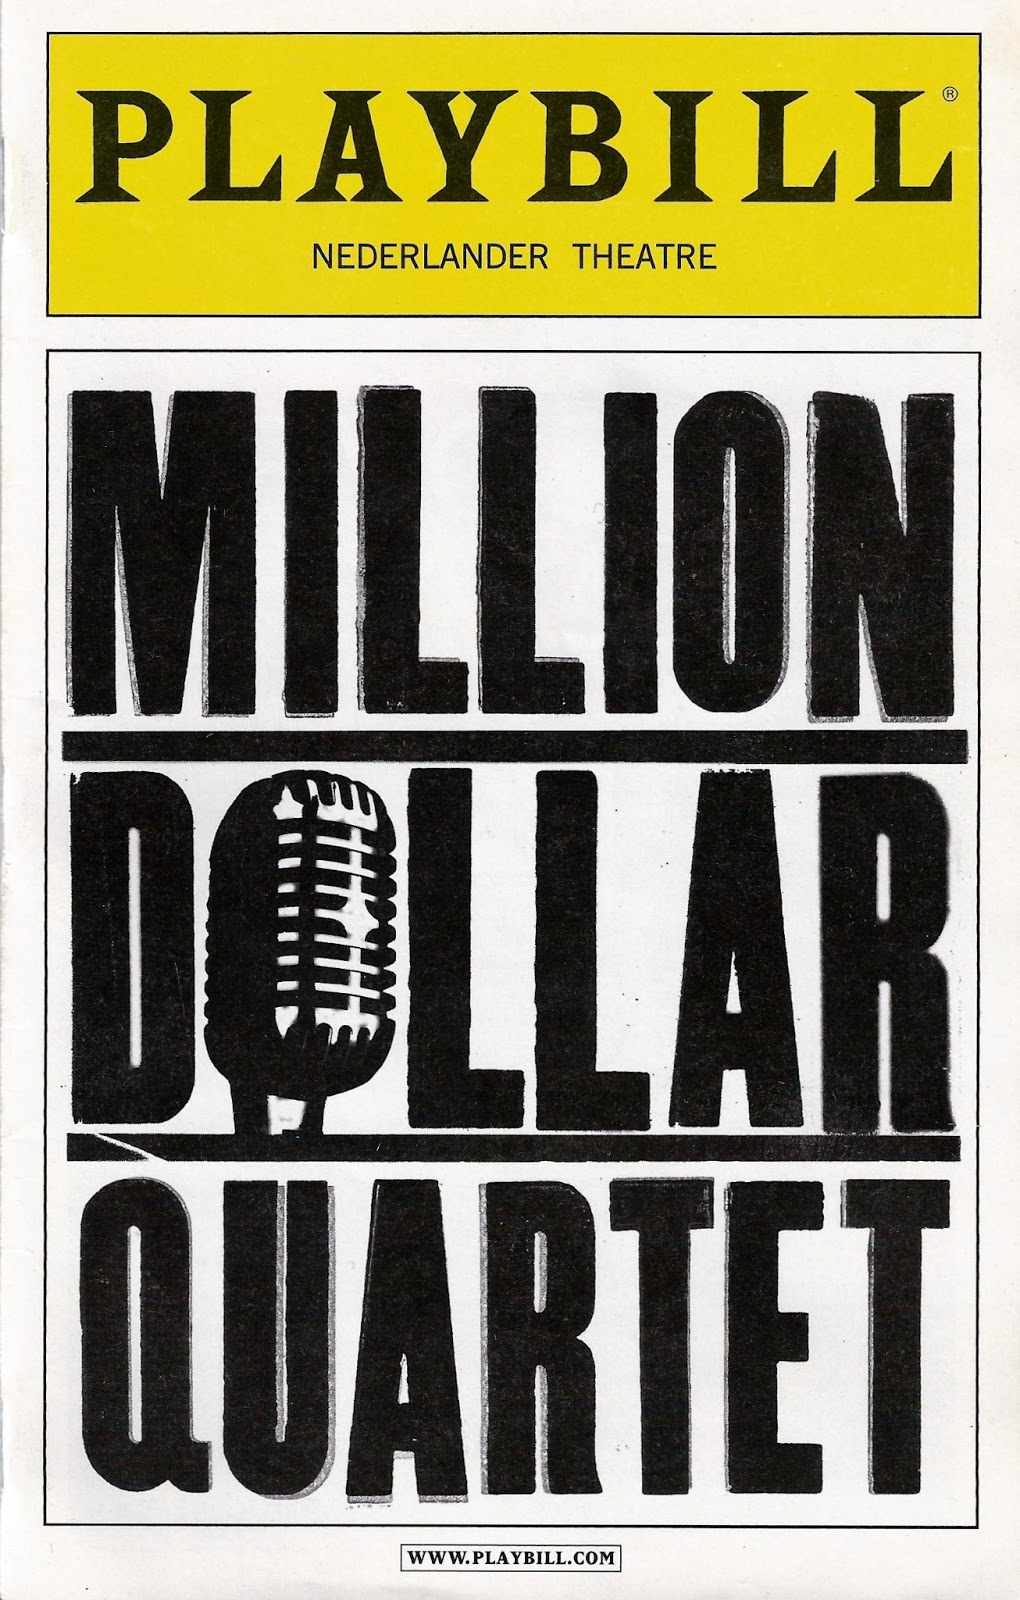 Broadway Playbill Template - Shefalitayal In Playbill Template Word